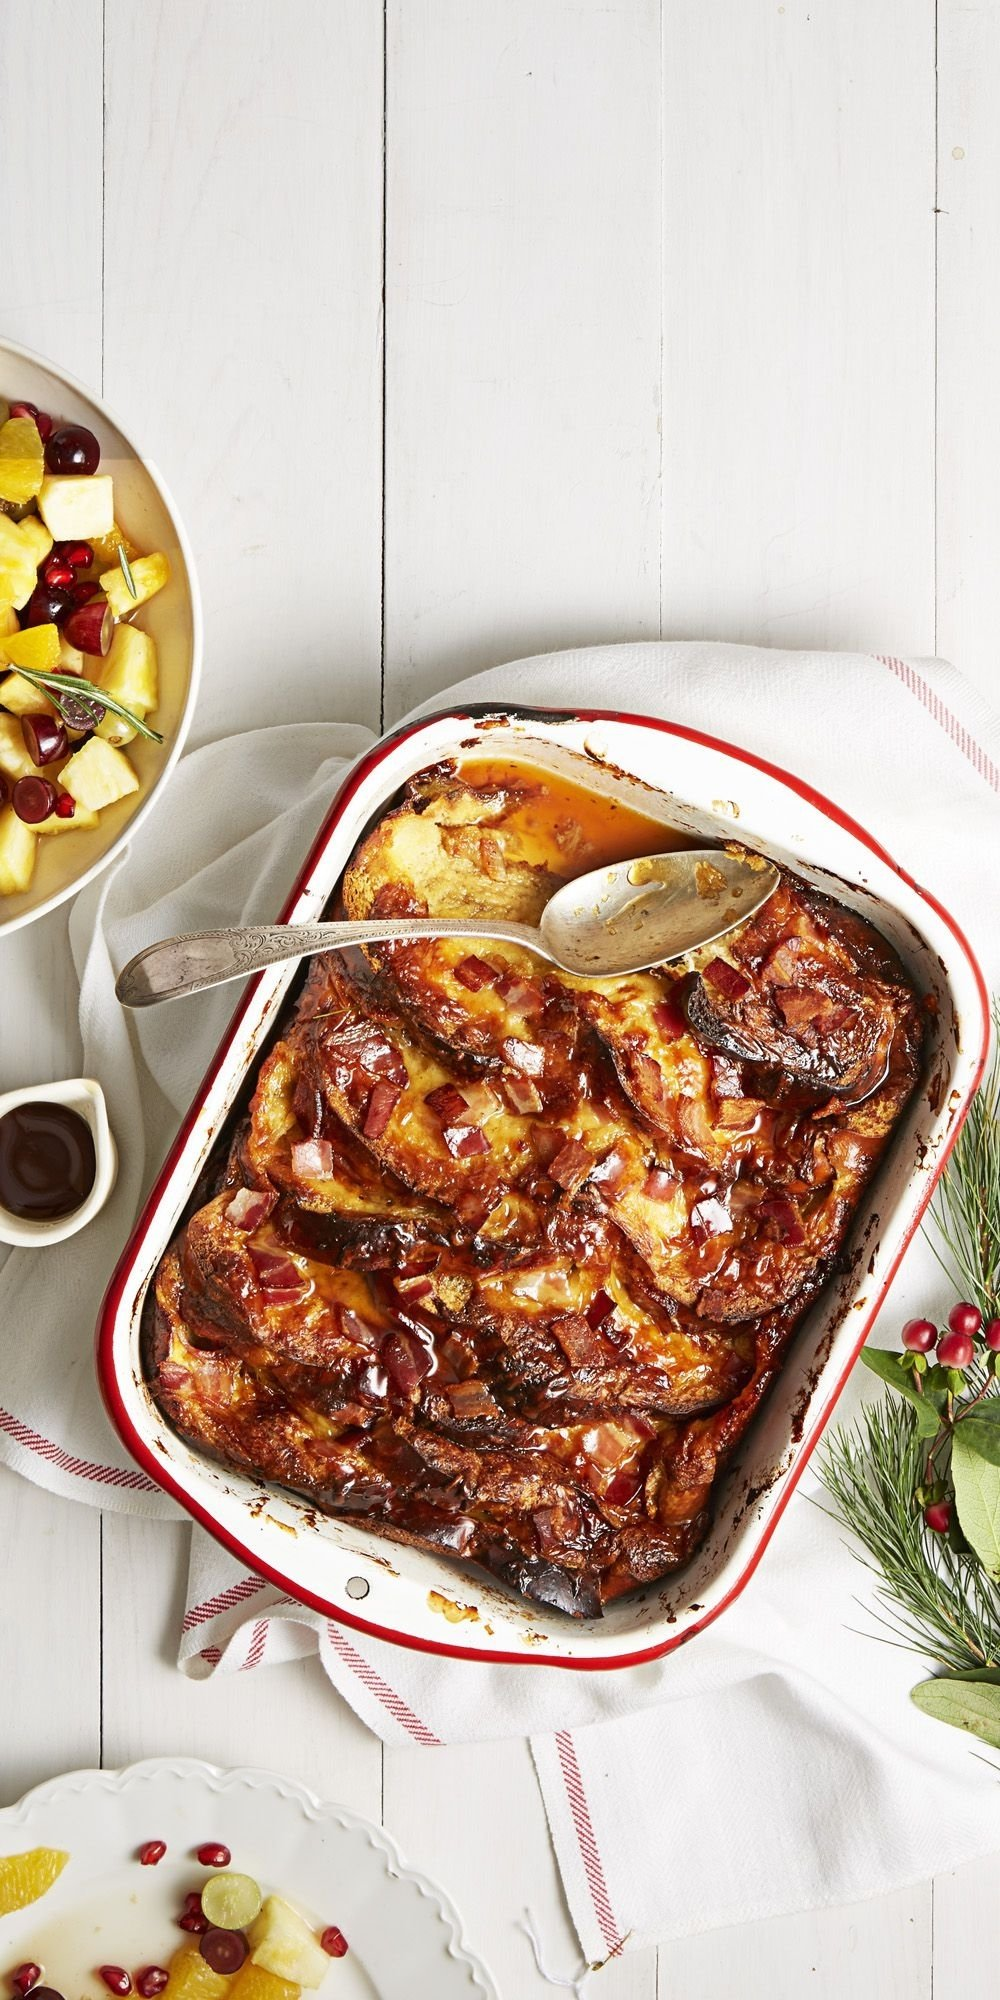 10 Nice Dinner Ideas For Big Family 32 family dinner ideas easy recipes for large groups 2020